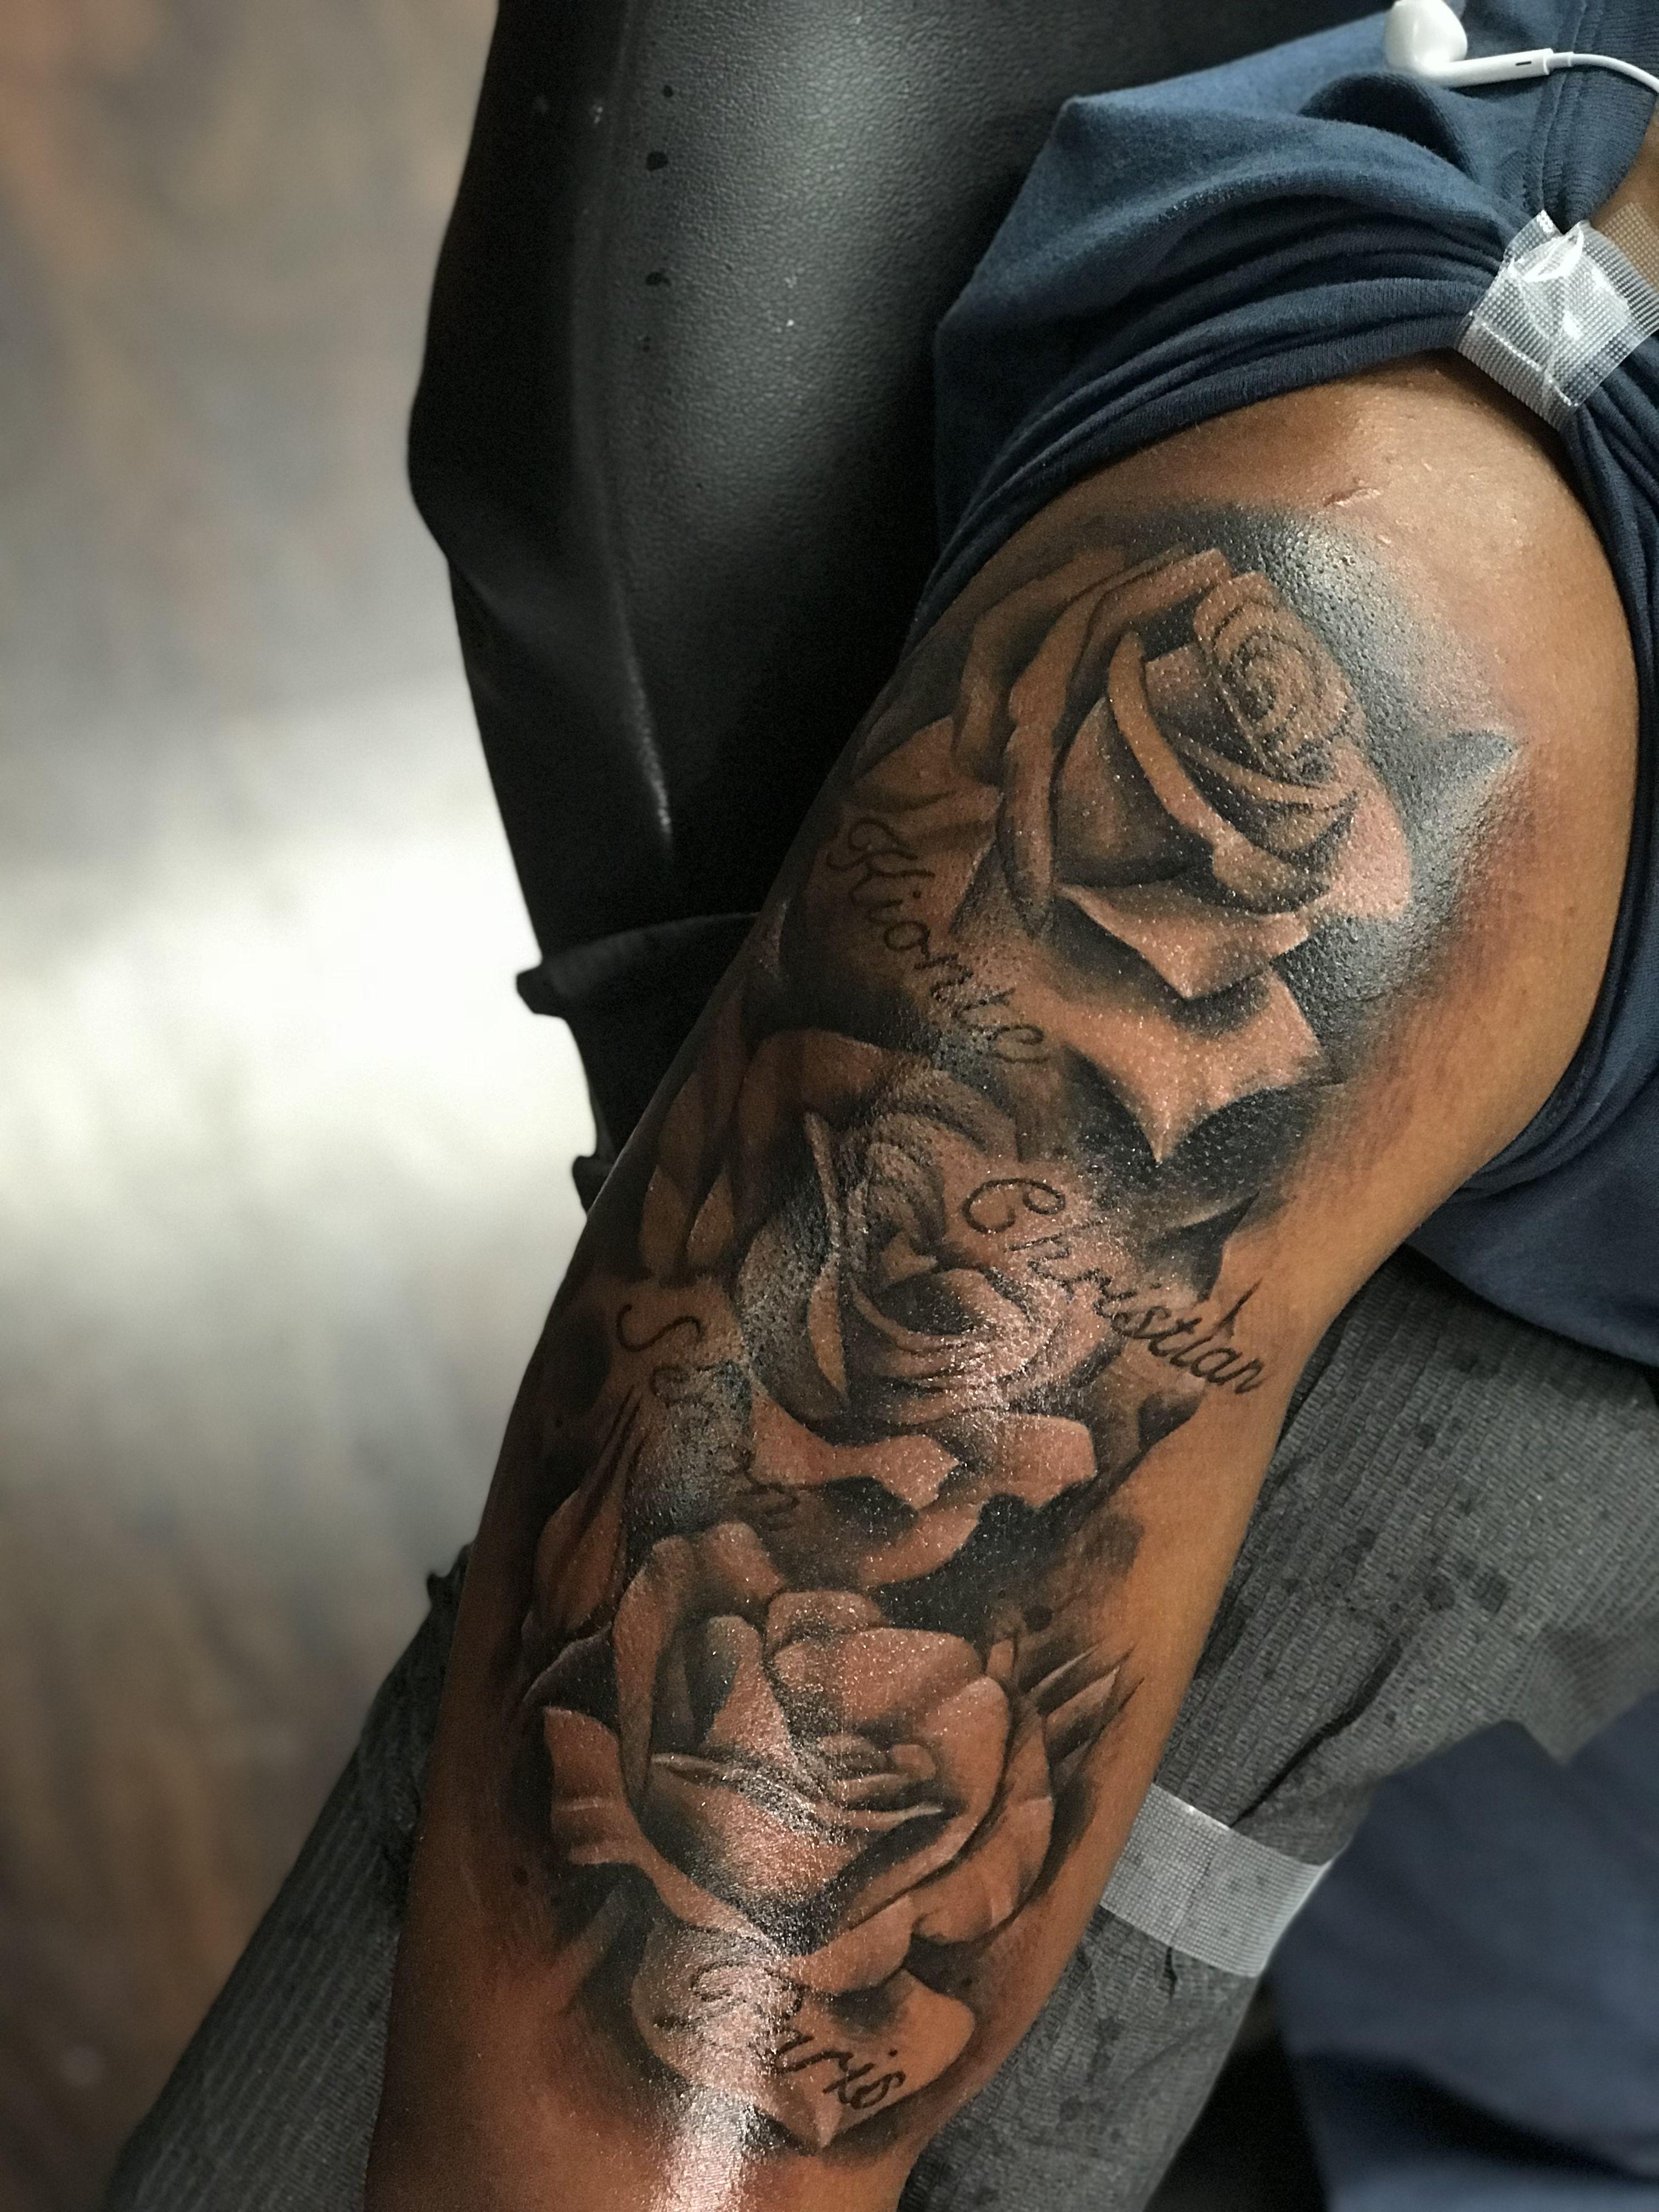 Roses Half Sleeve Tattoo Dark Skin Tattoo Half Sleeve Rose Tattoo Sleeve Tattoos